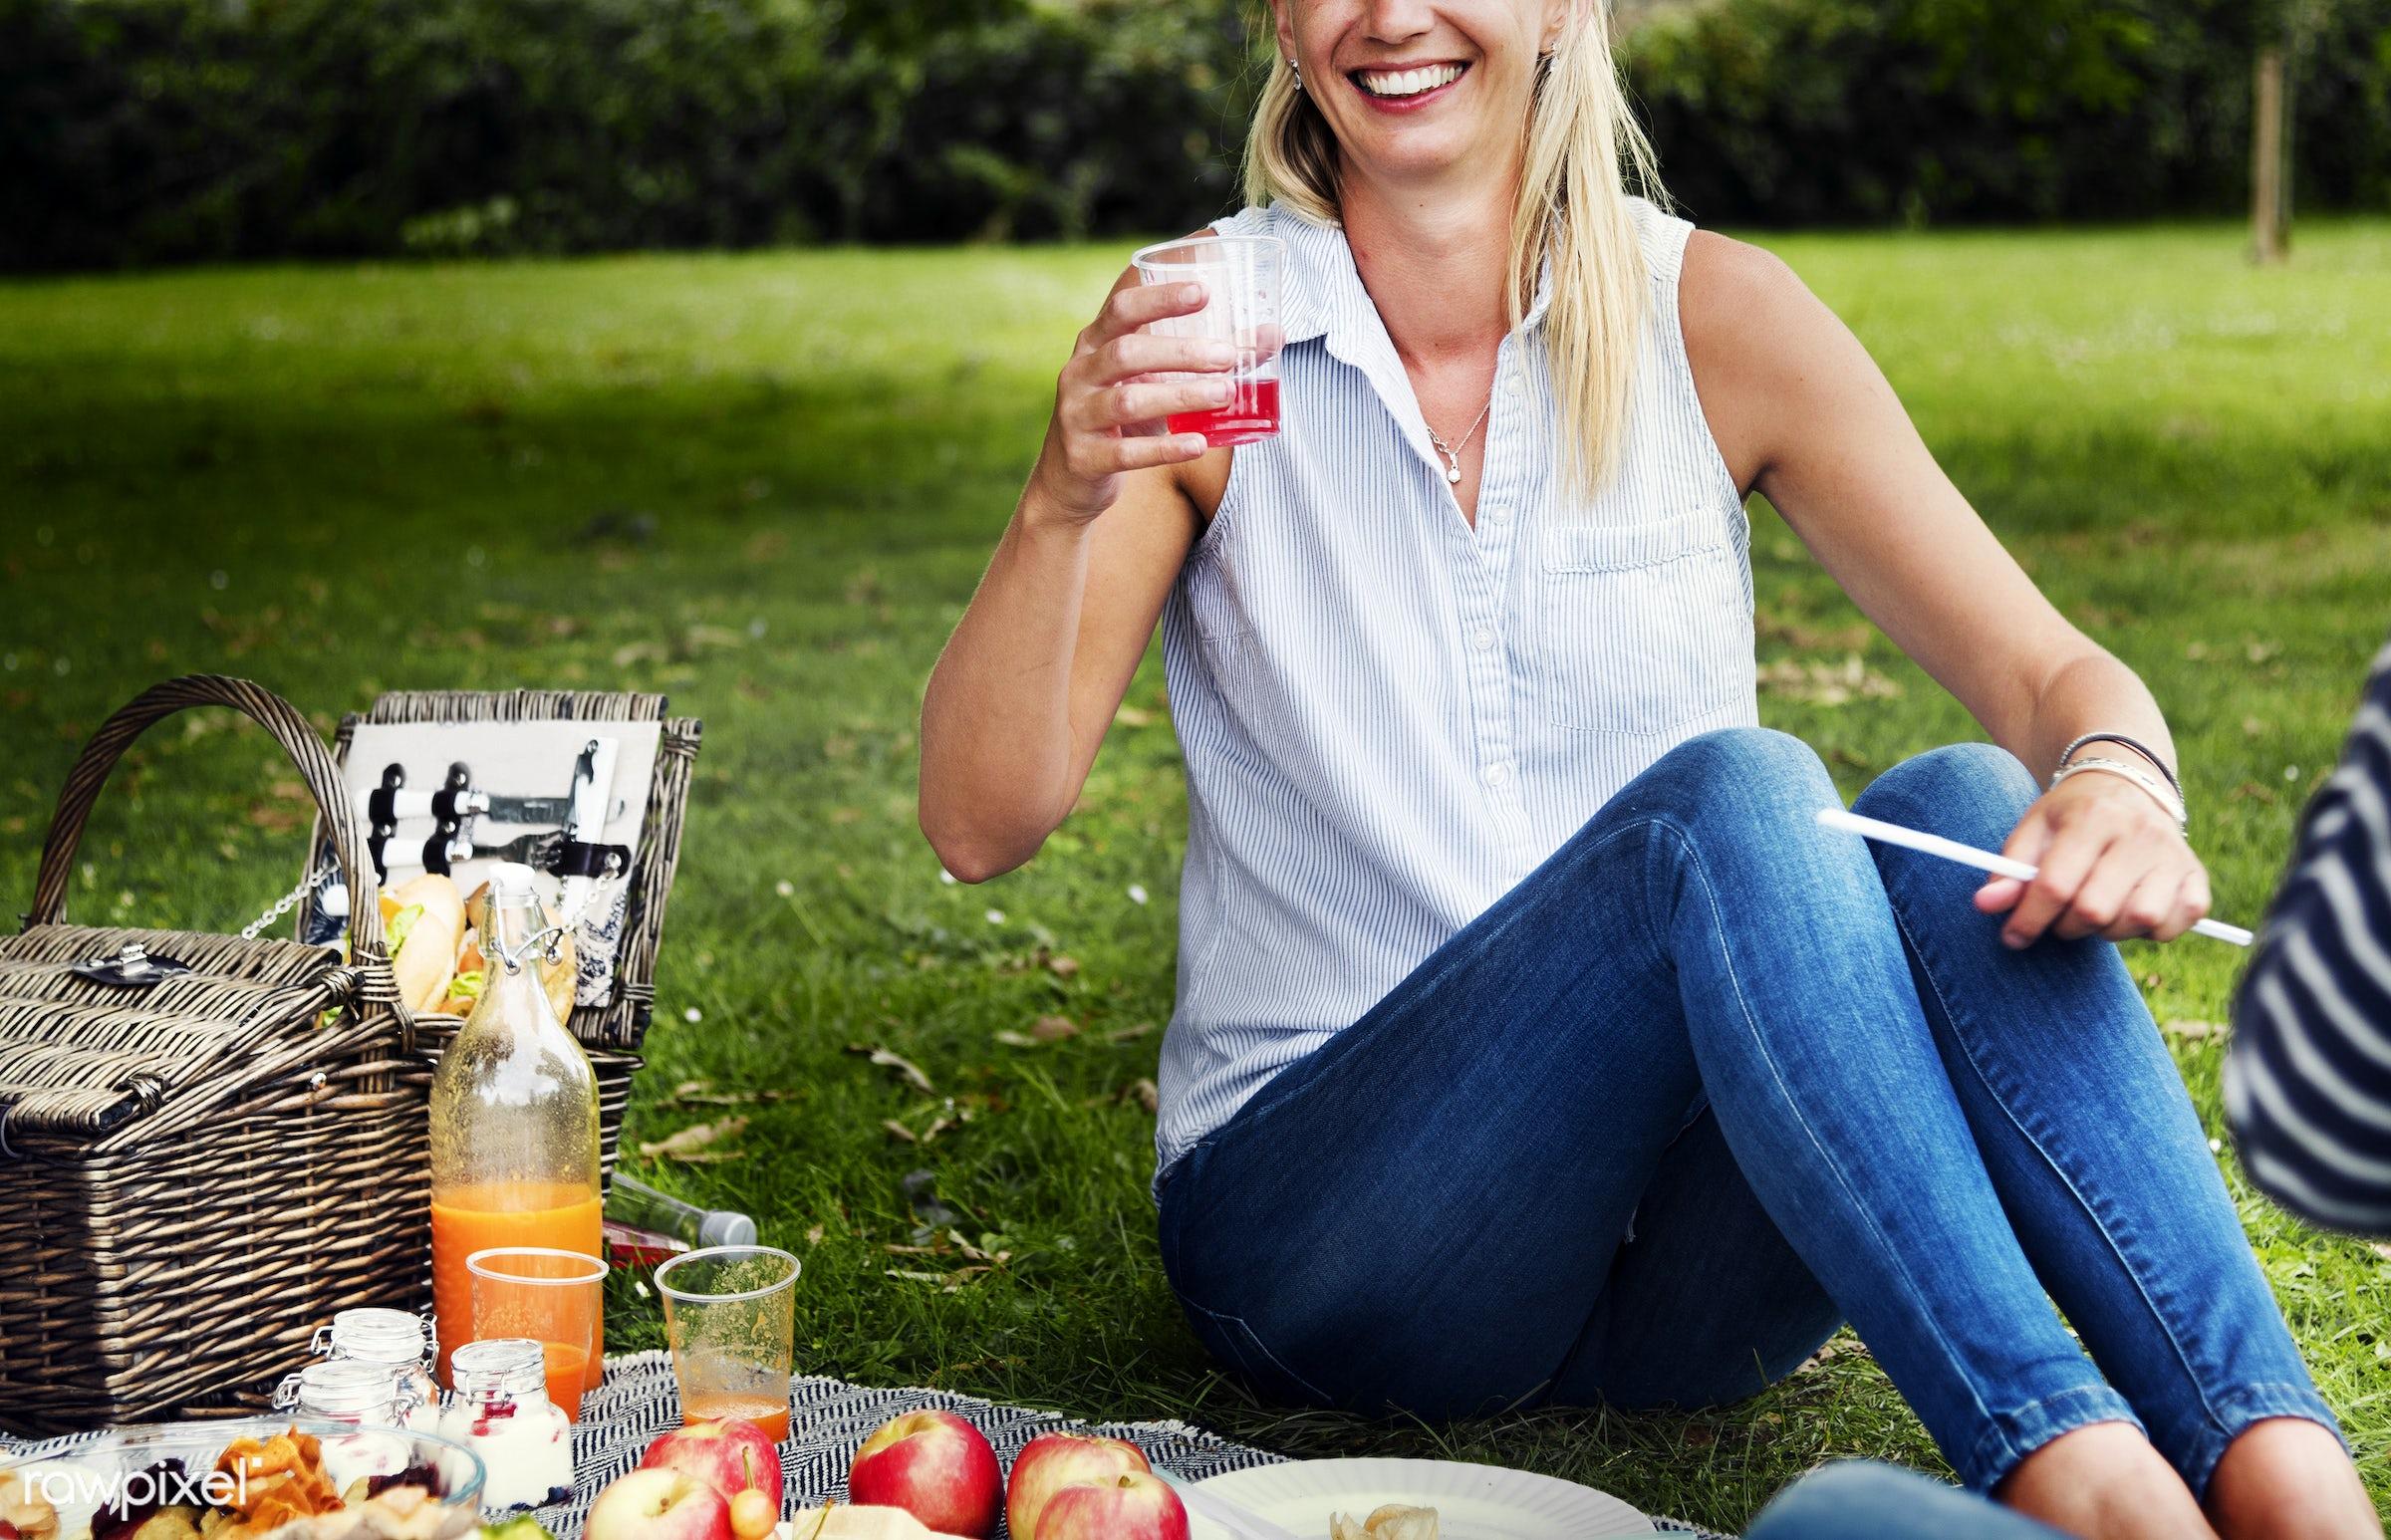 apple, basket, casual, cheerful, drinks, enjoyment, environmental, field, food, fruit, fun, garden, grass, happiness,...